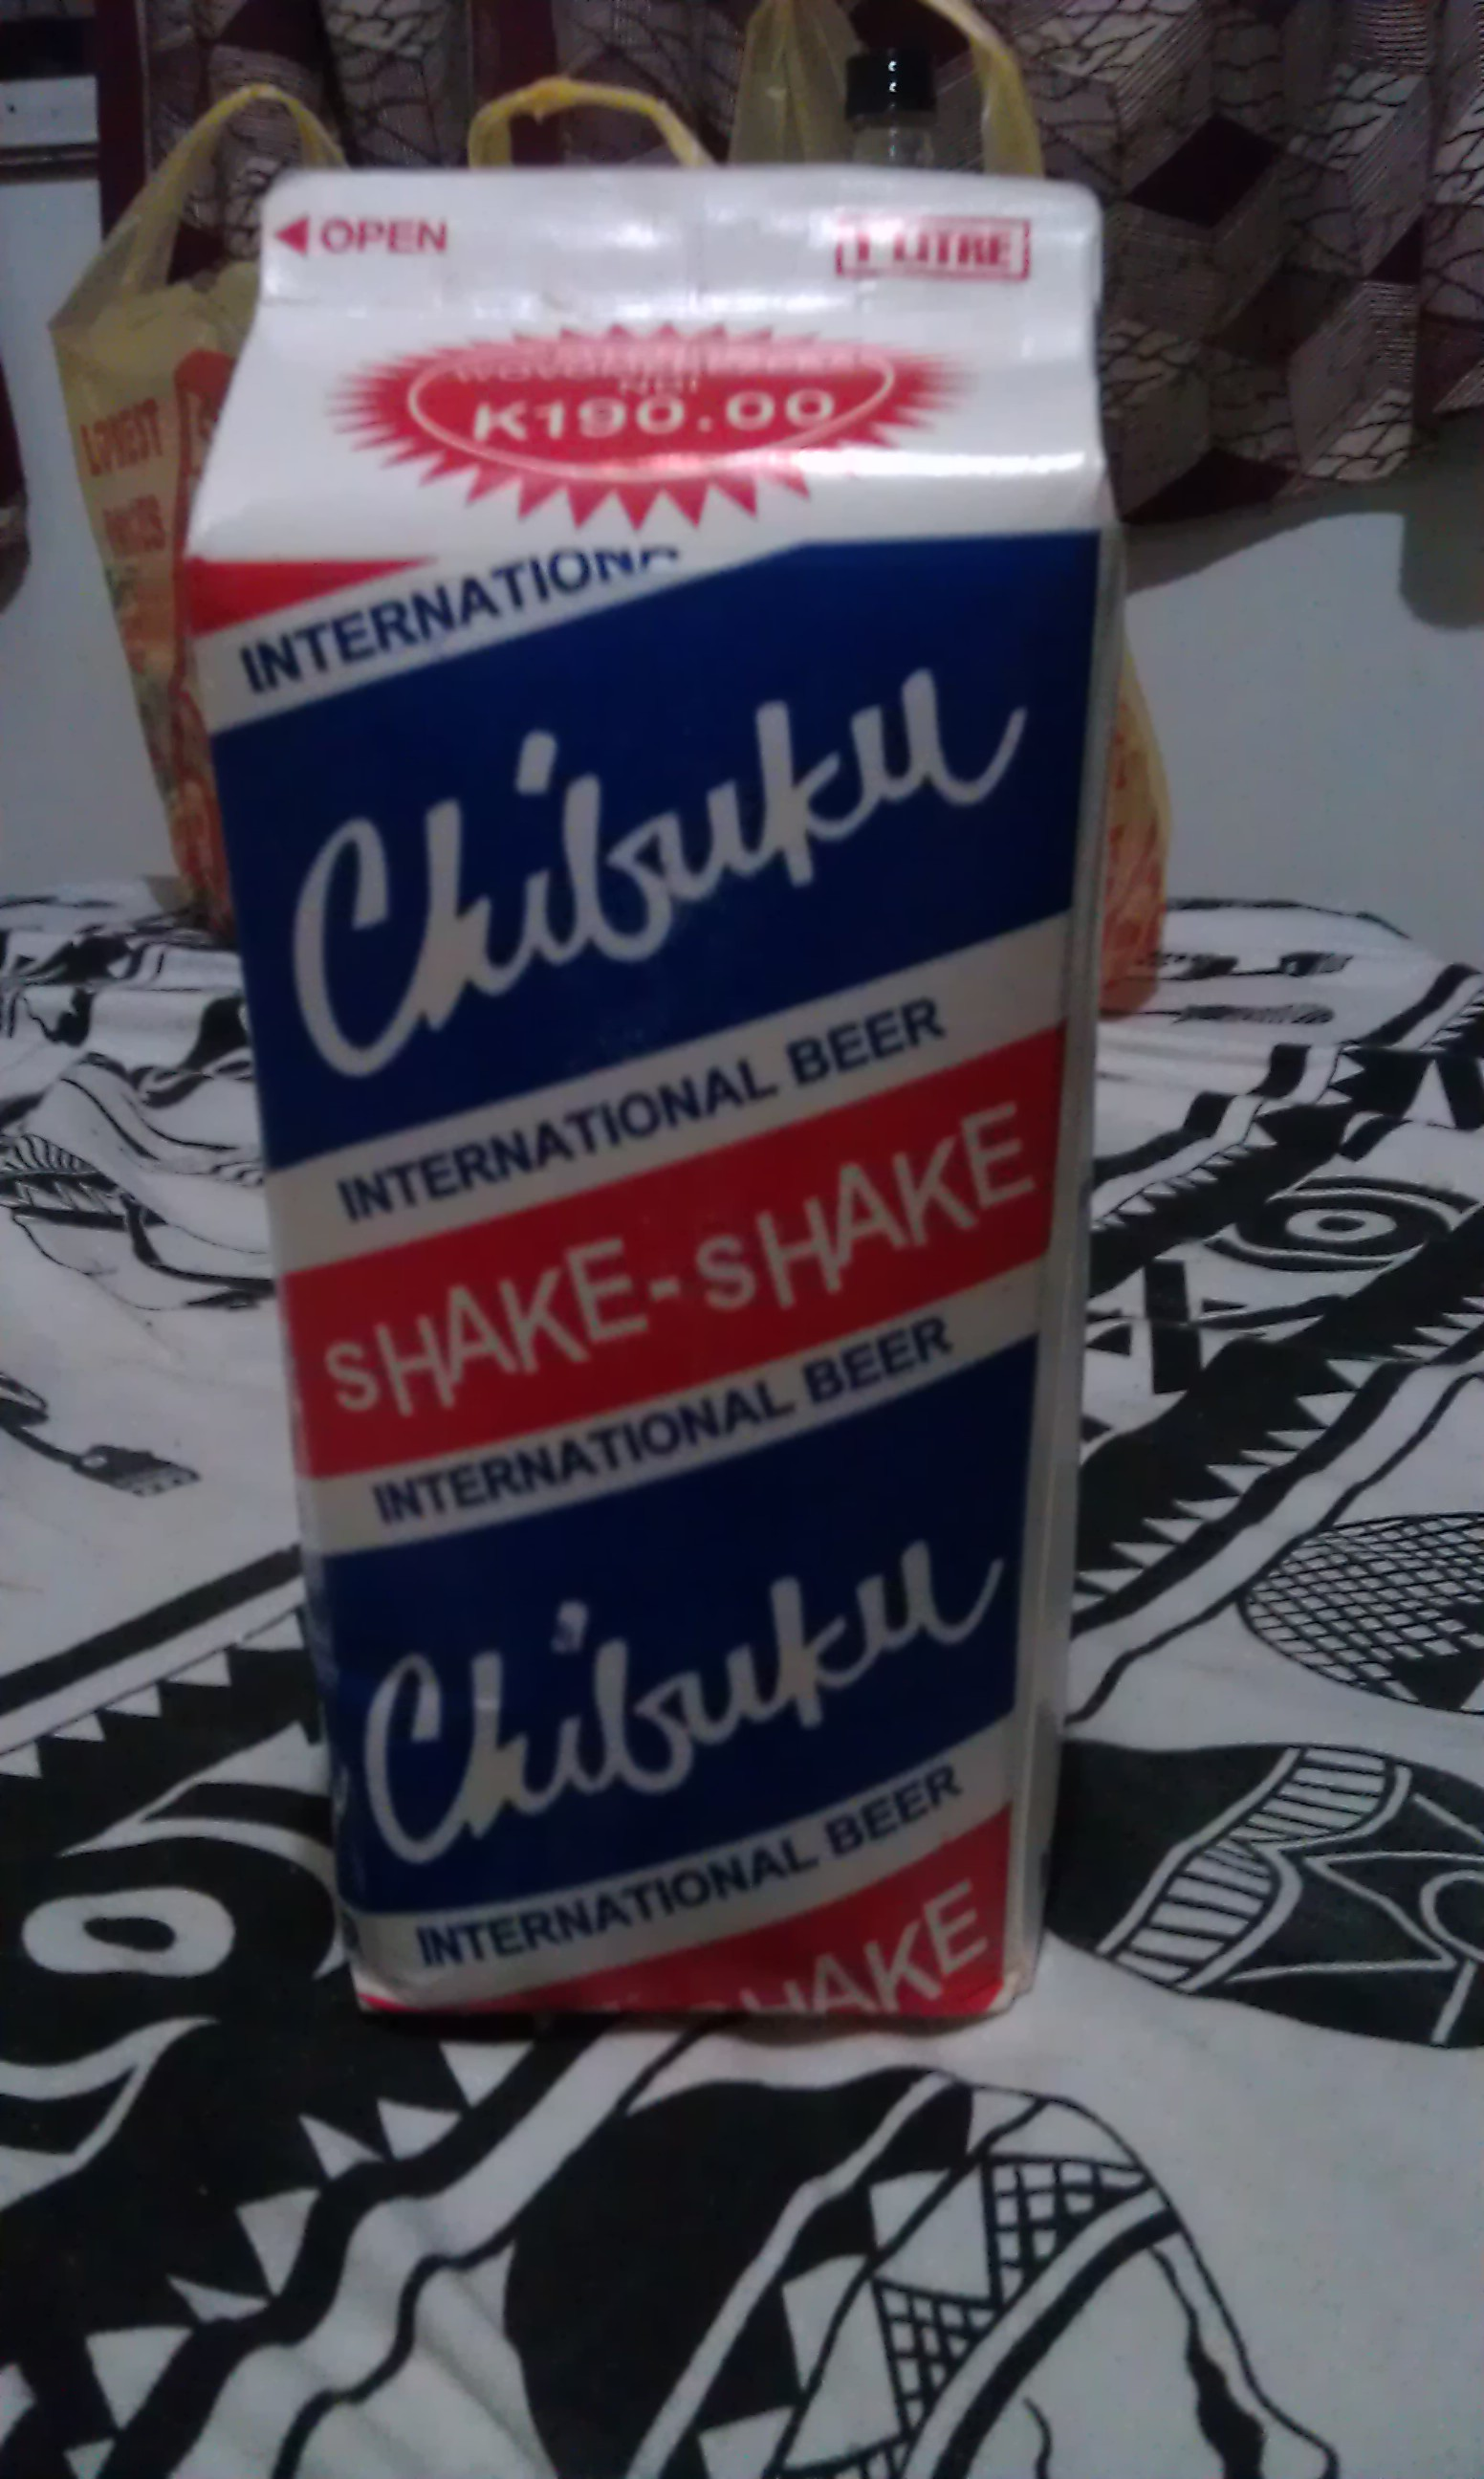 Chibuku – Shake Shake